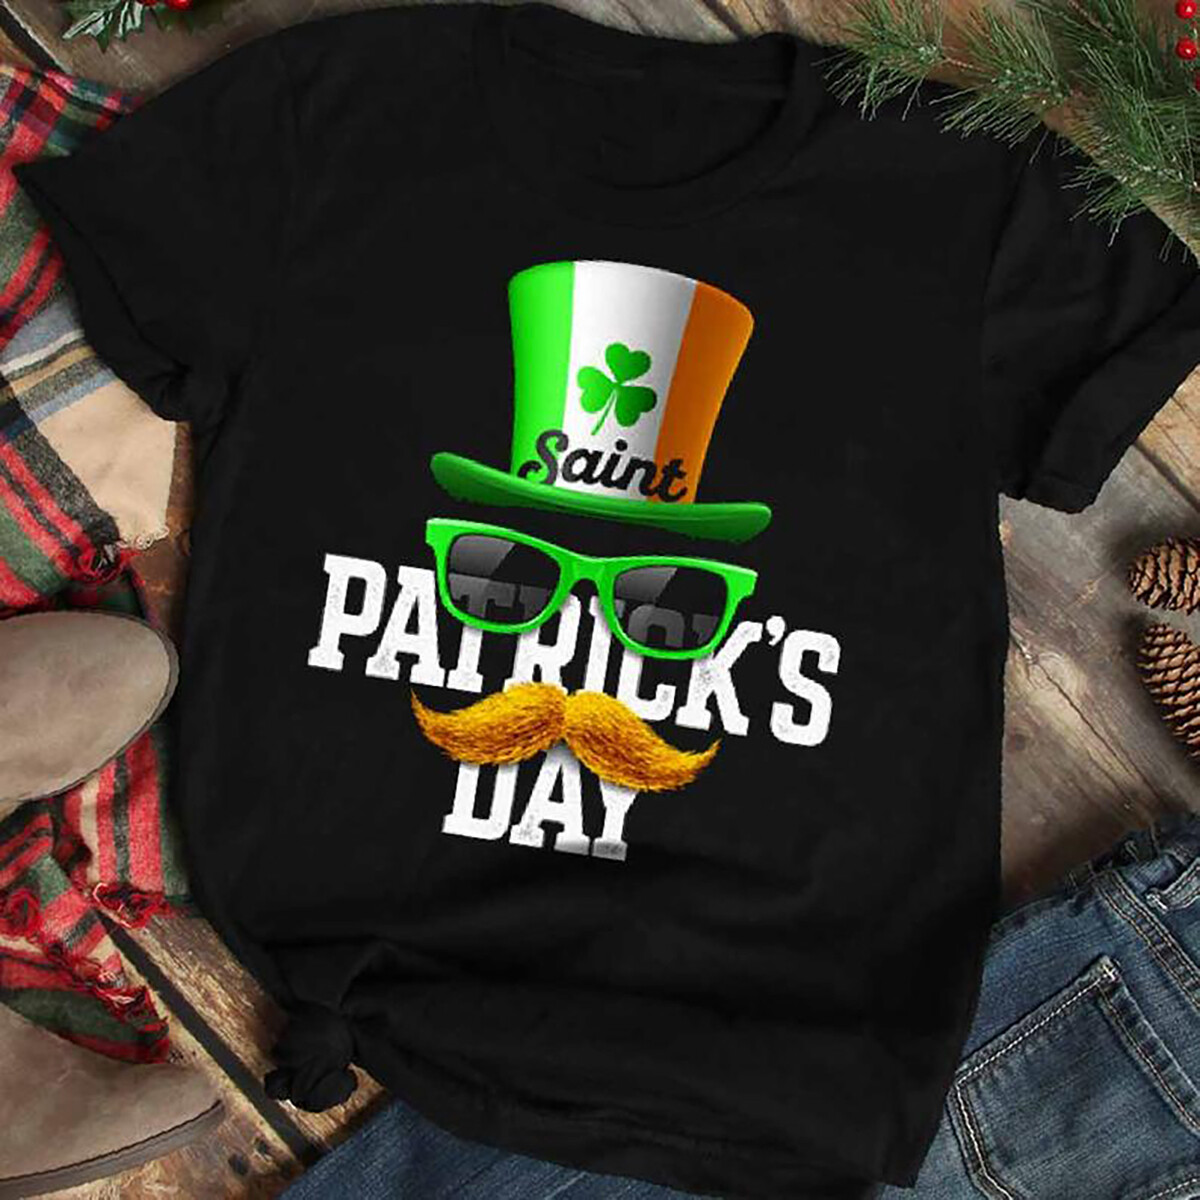 St Patrick's Day Leprechaun Hat Shirt-Leprechaun Hat St Patricks Day Shirt,St Patricks Tee,Irish Shirt,St Paddy Shirt,Disney St Patricks Day